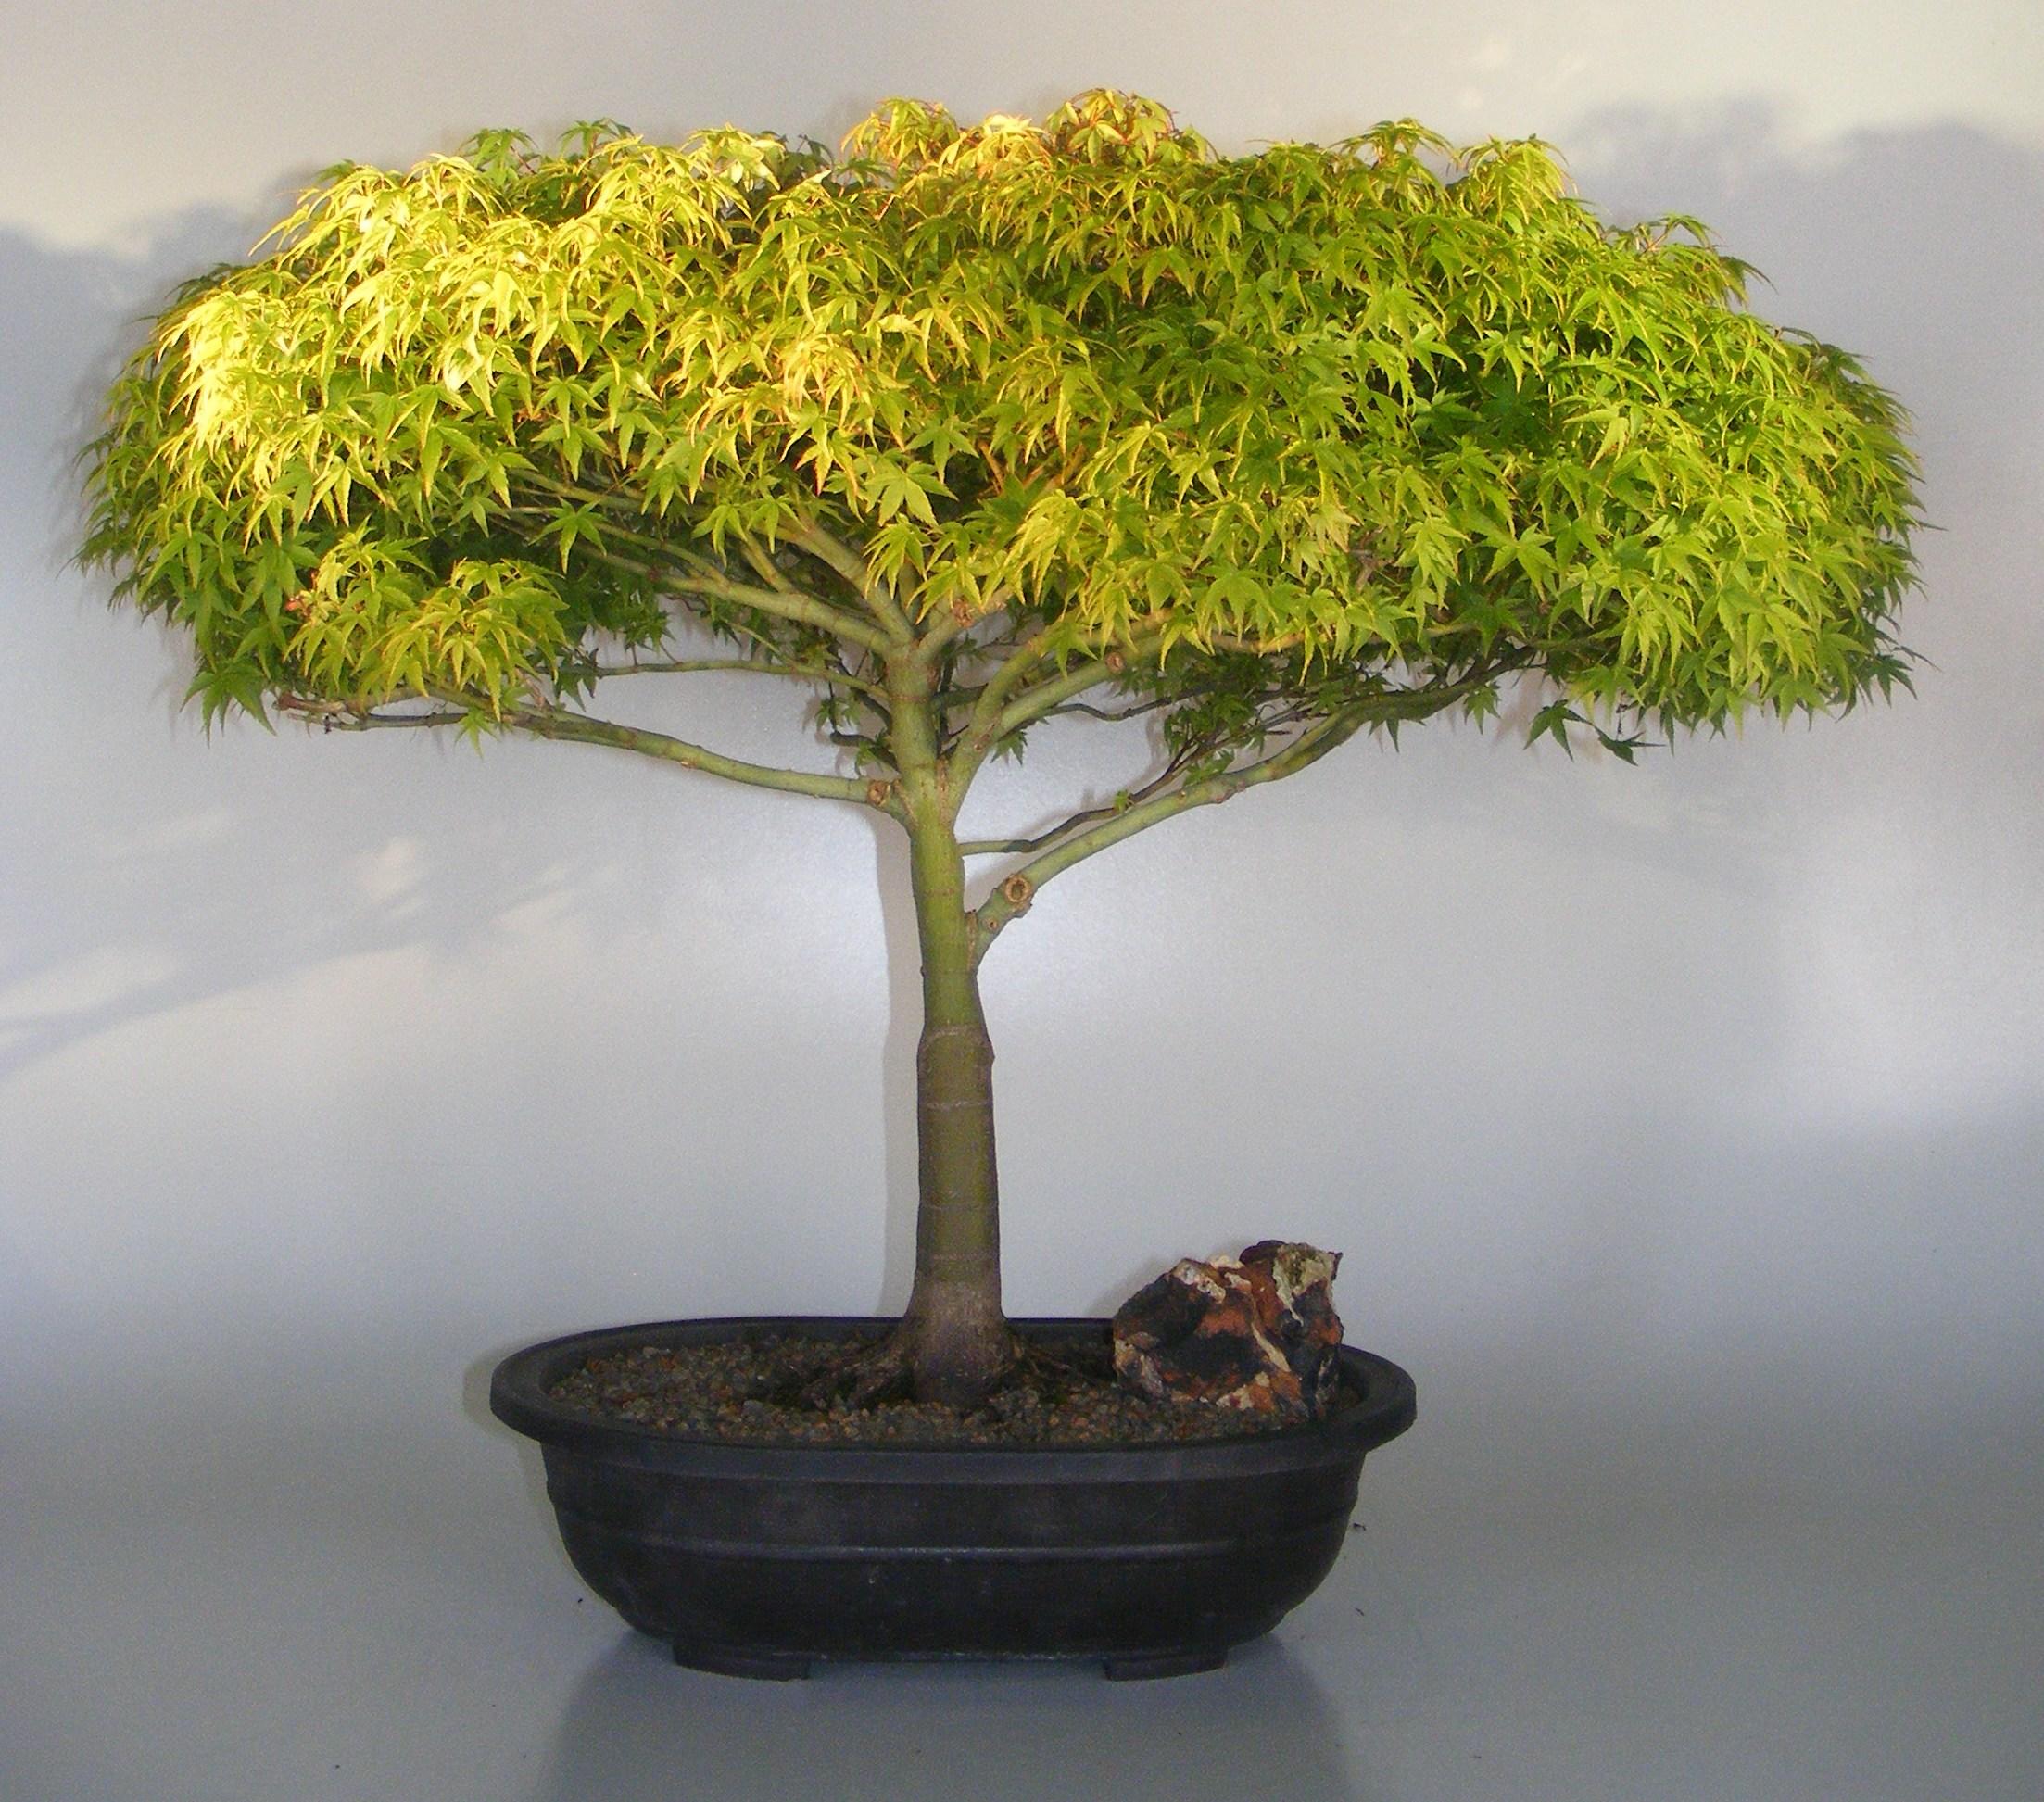 Dwarf Japanese Maple Bonsai Tree(acer palmatum 'Capercis Dwarf') Image